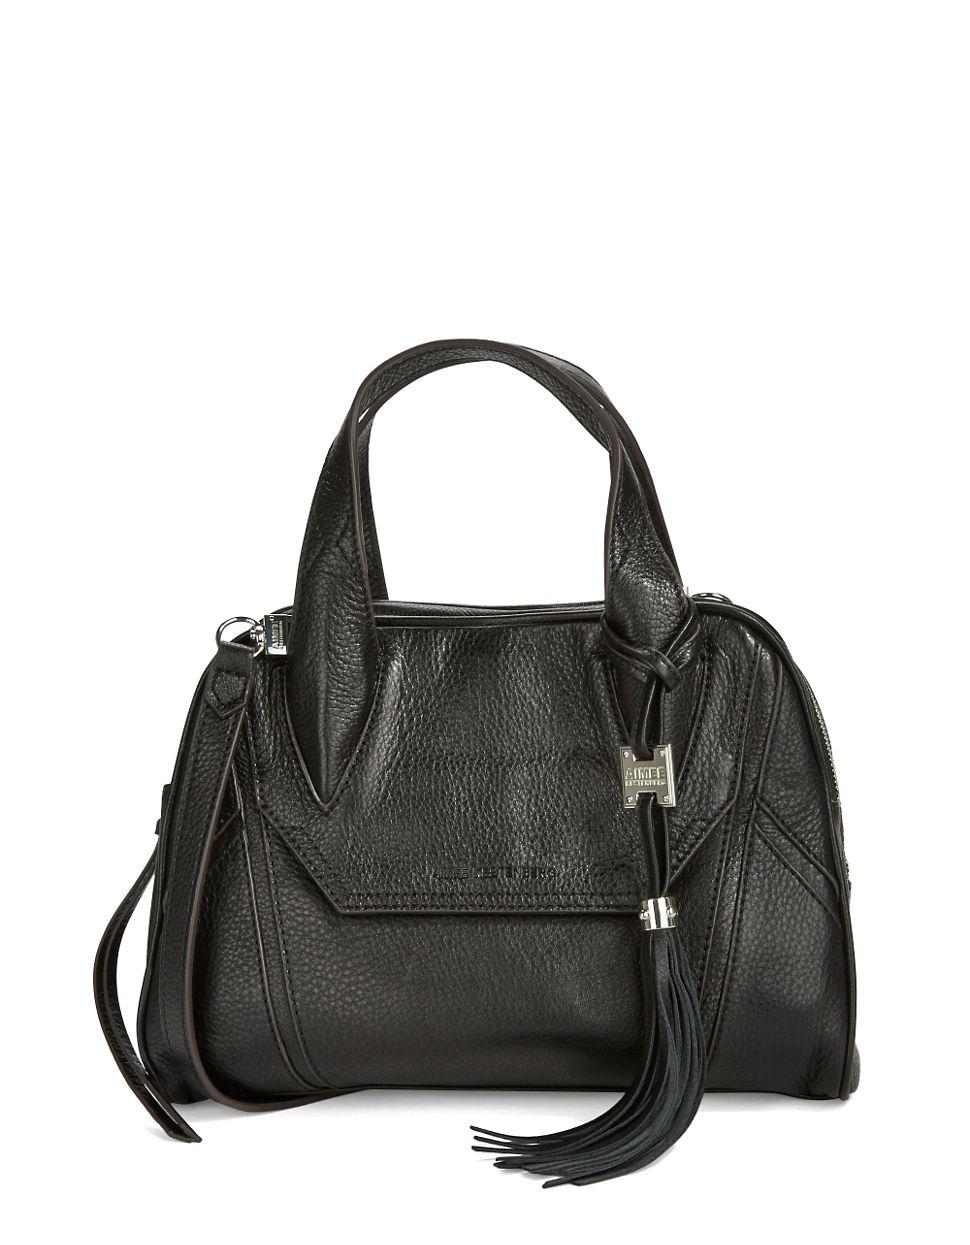 lyst aimee kestenberg madison satchel in black